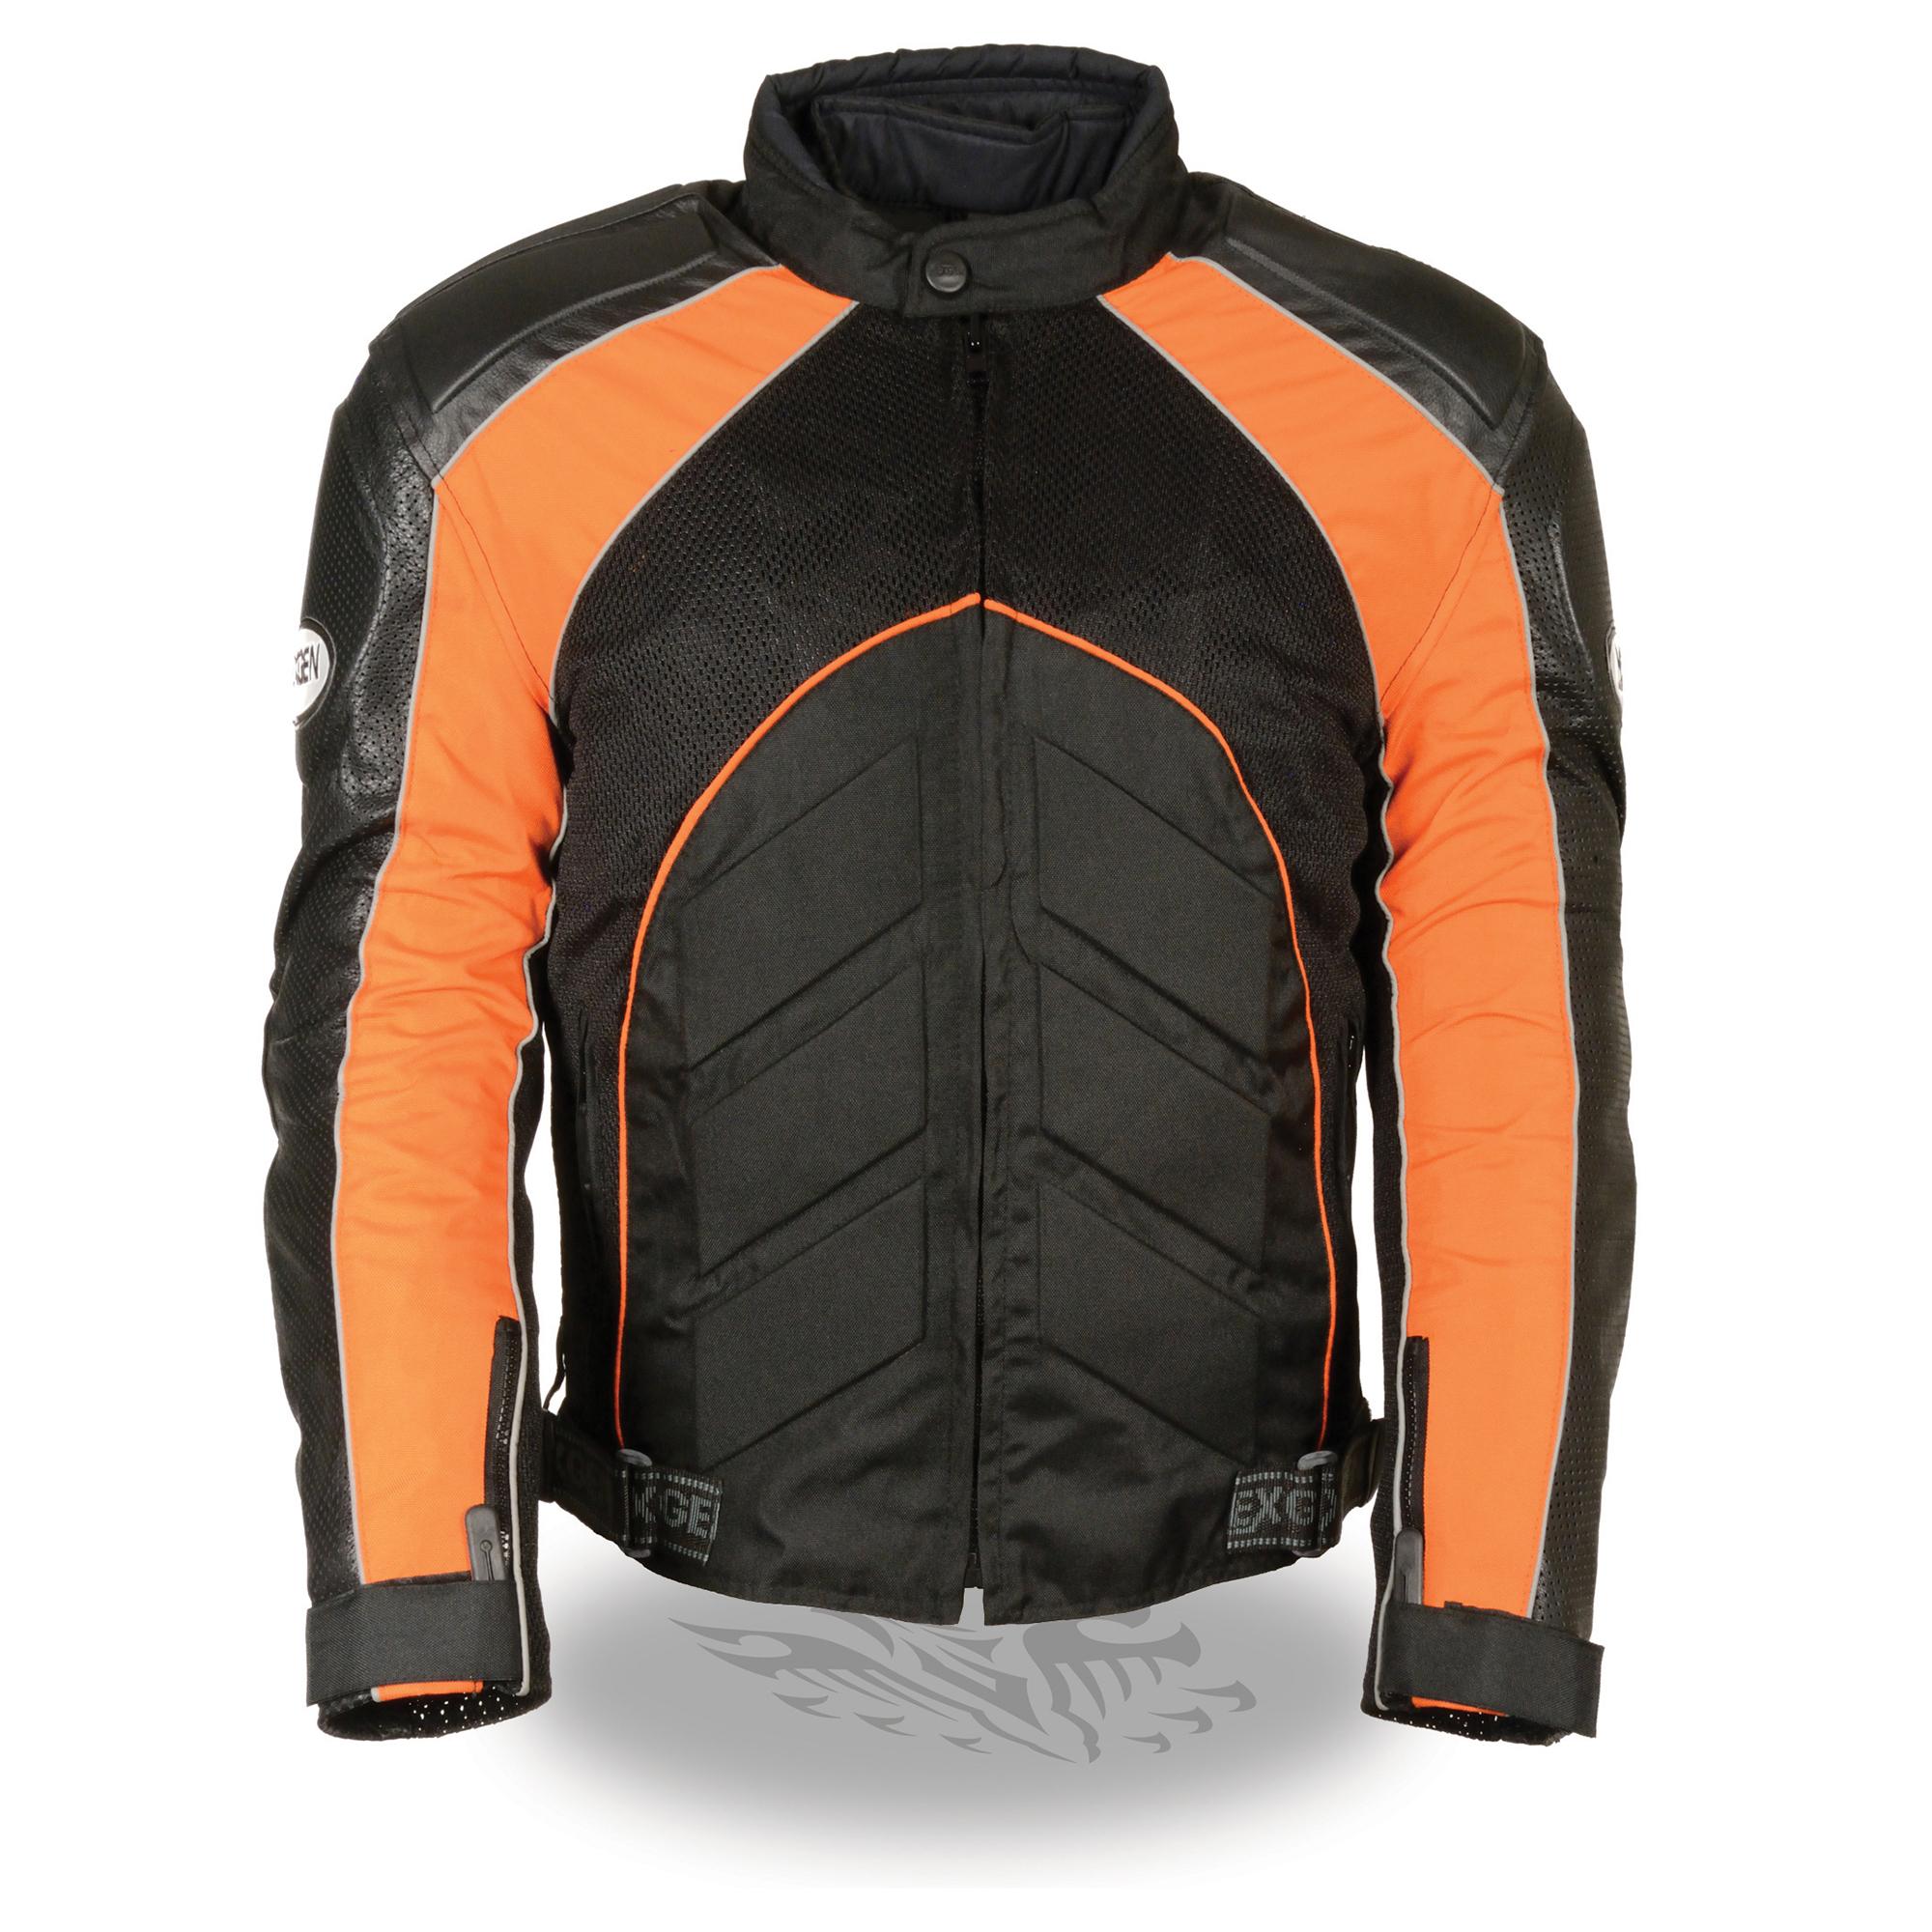 Mens Combo Leather / Textile / Mesh Racer Jacket